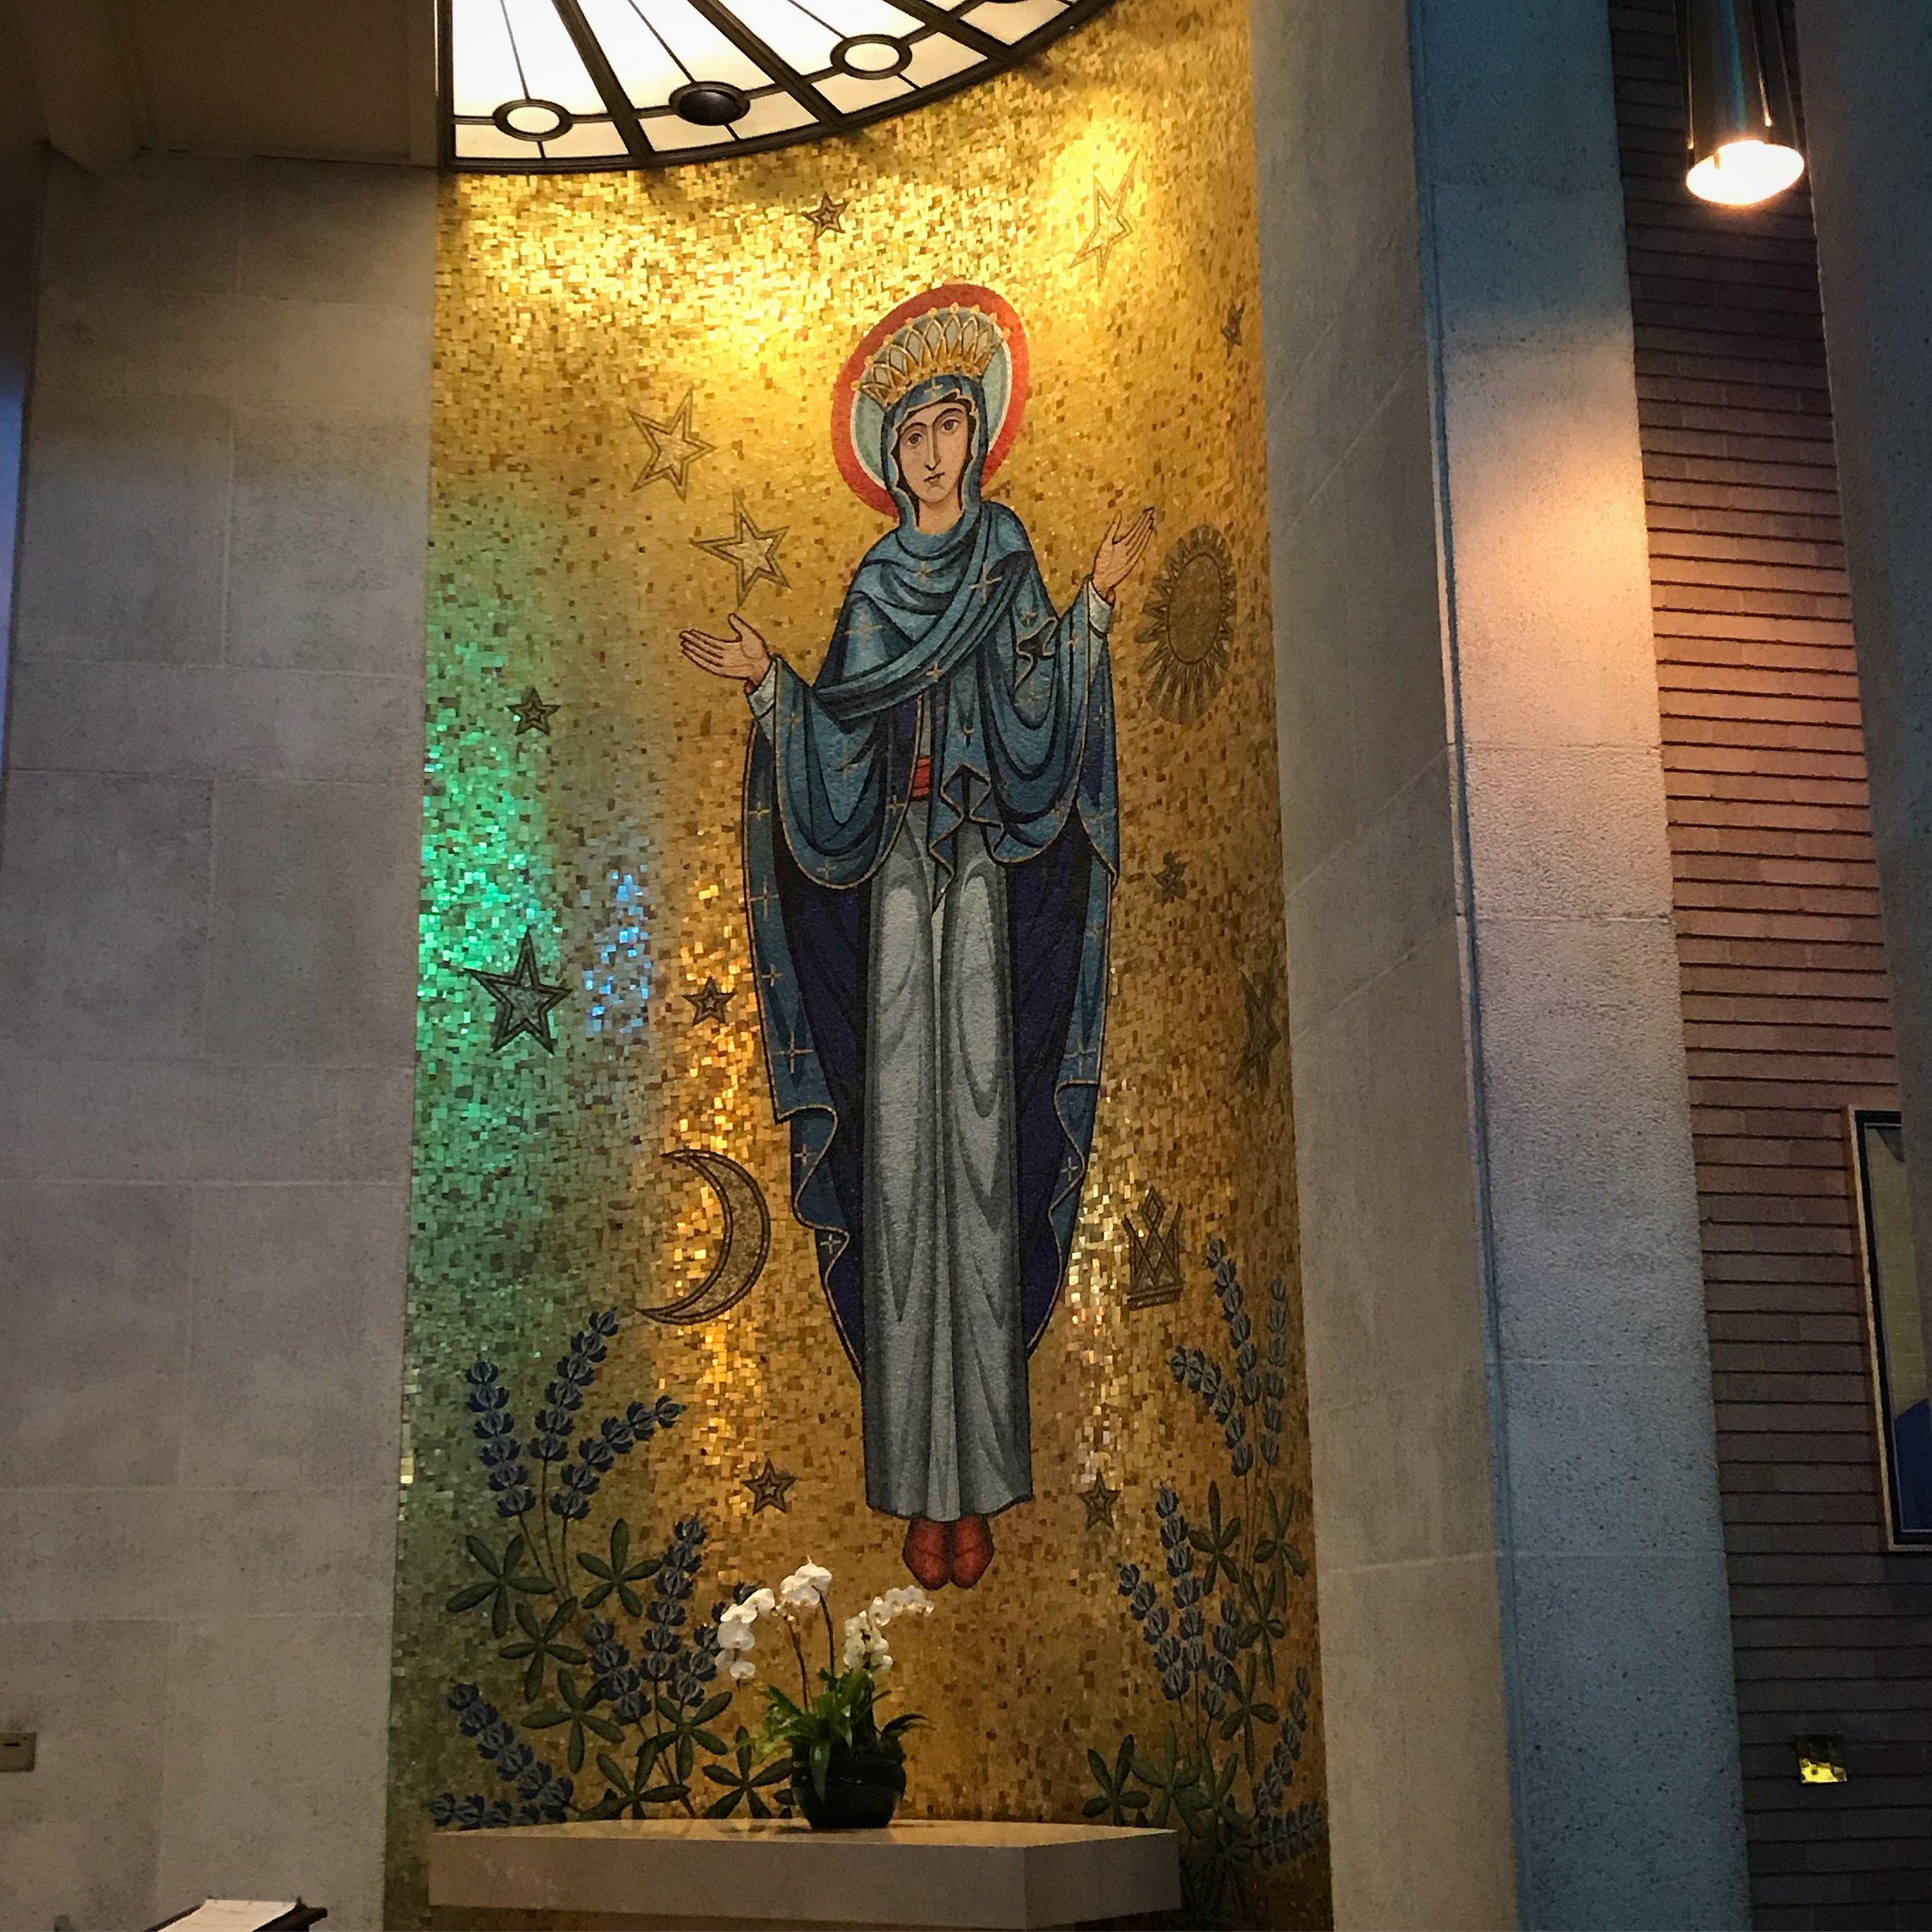 St. Mary, Side Chapel St. Michael Catholic Church, Houston.